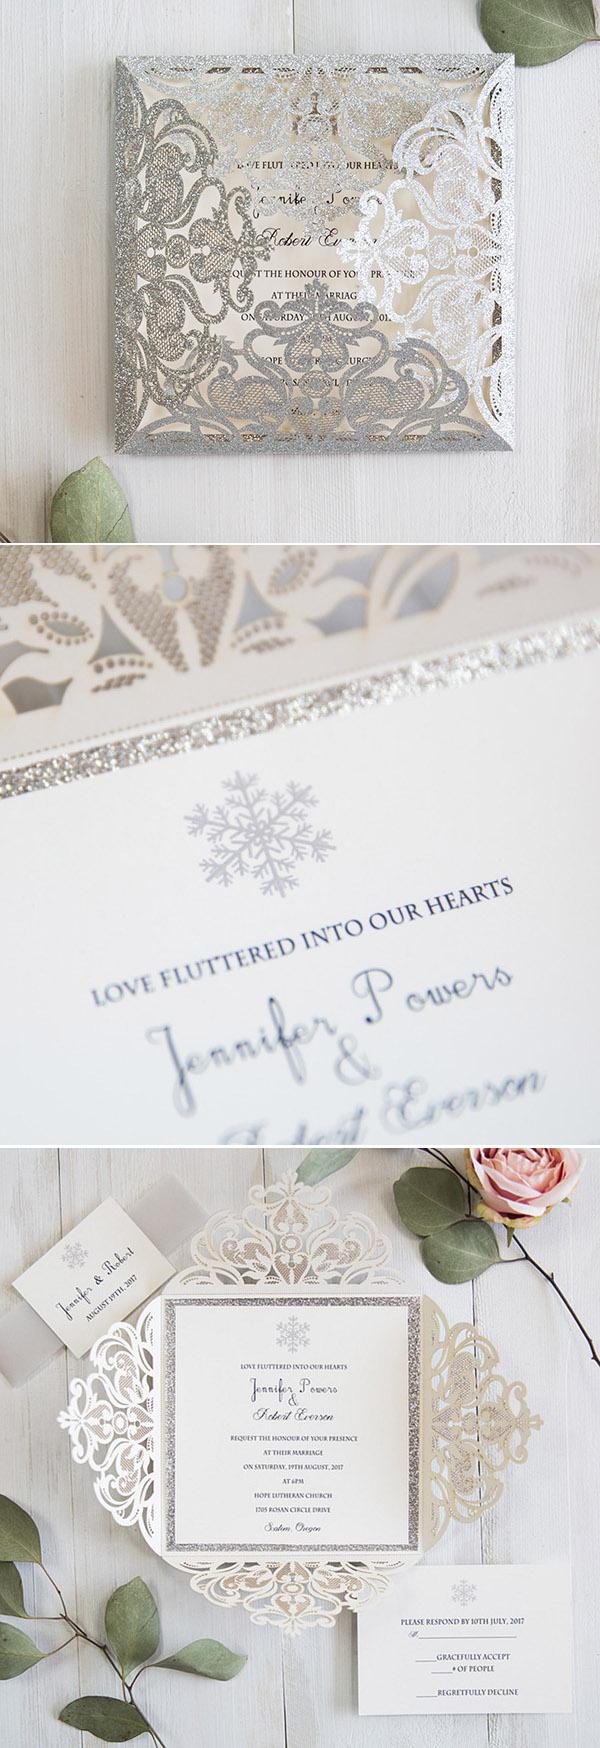 Romantic Snowflake Wedding Invitations Ideas For Winter